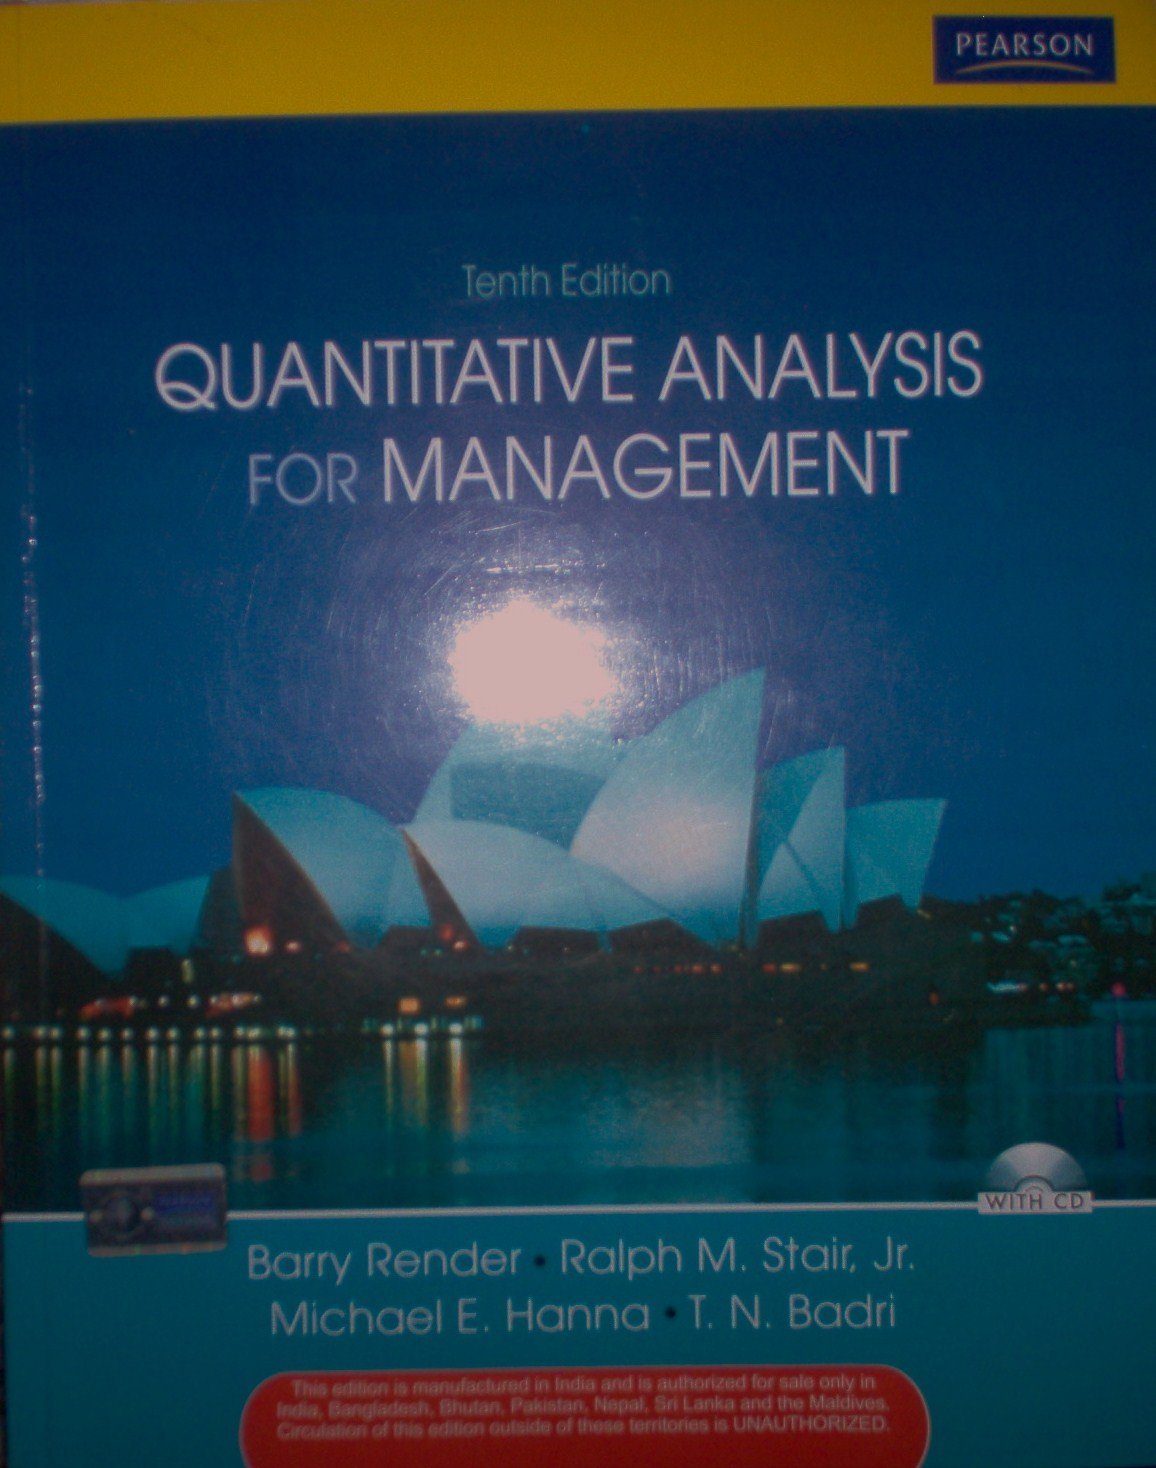 Quantitative Analysis for Management 10th edition PDF